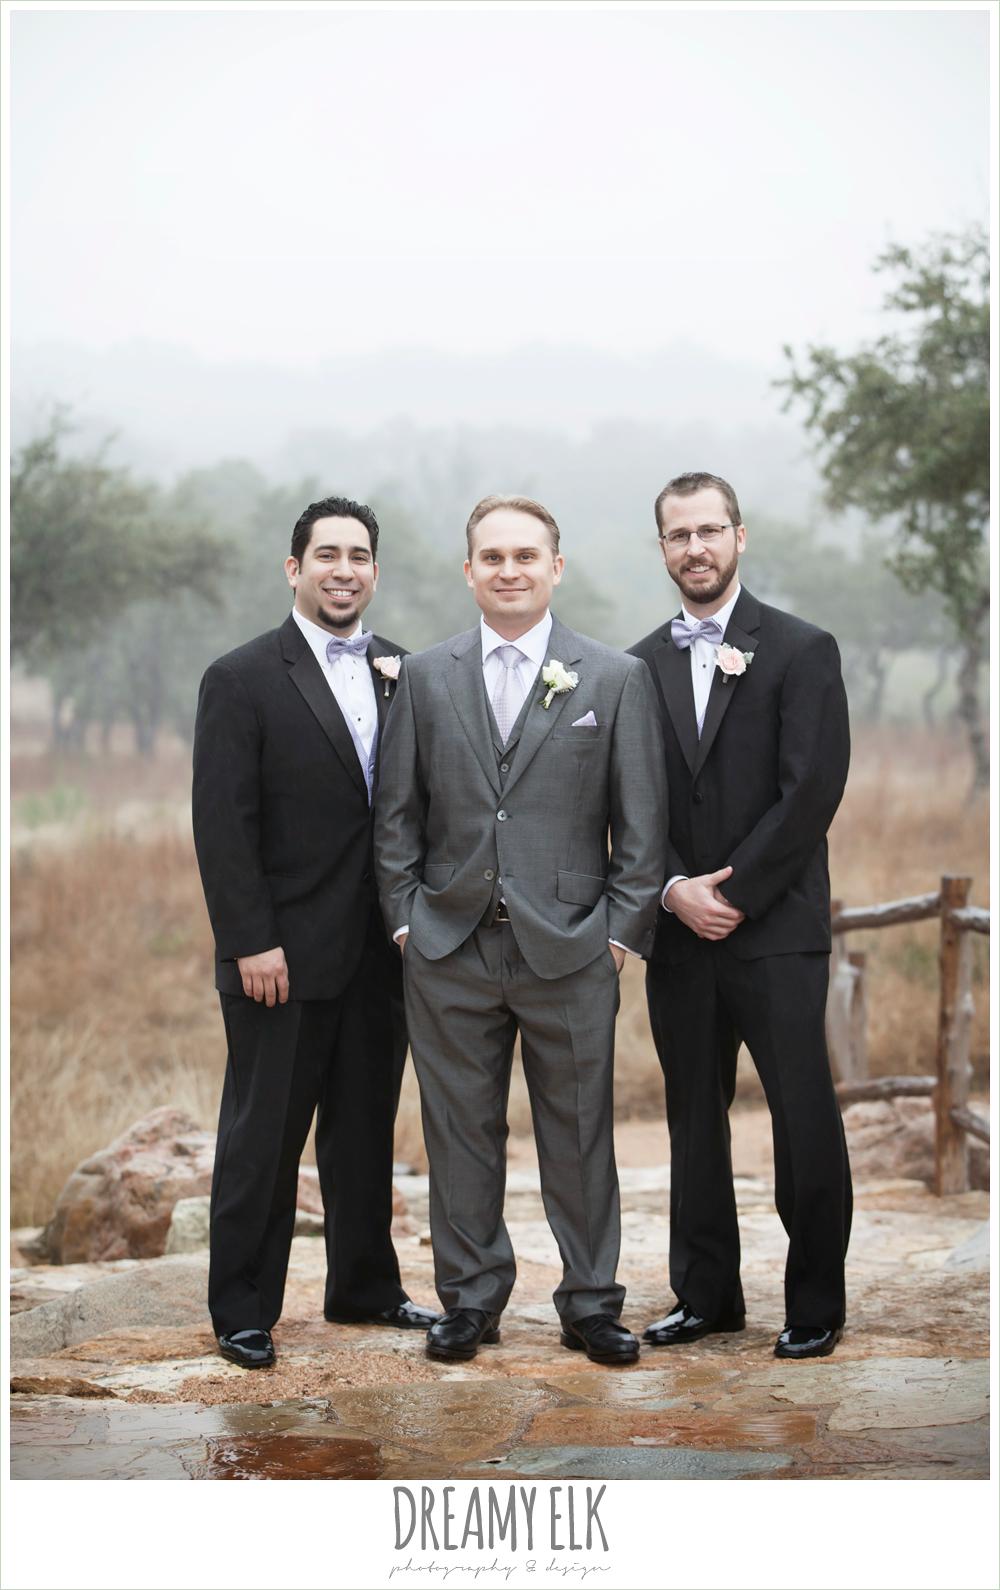 groom in gray, groomsmen in black, foggy wedding day {dreamy elk photography and design}